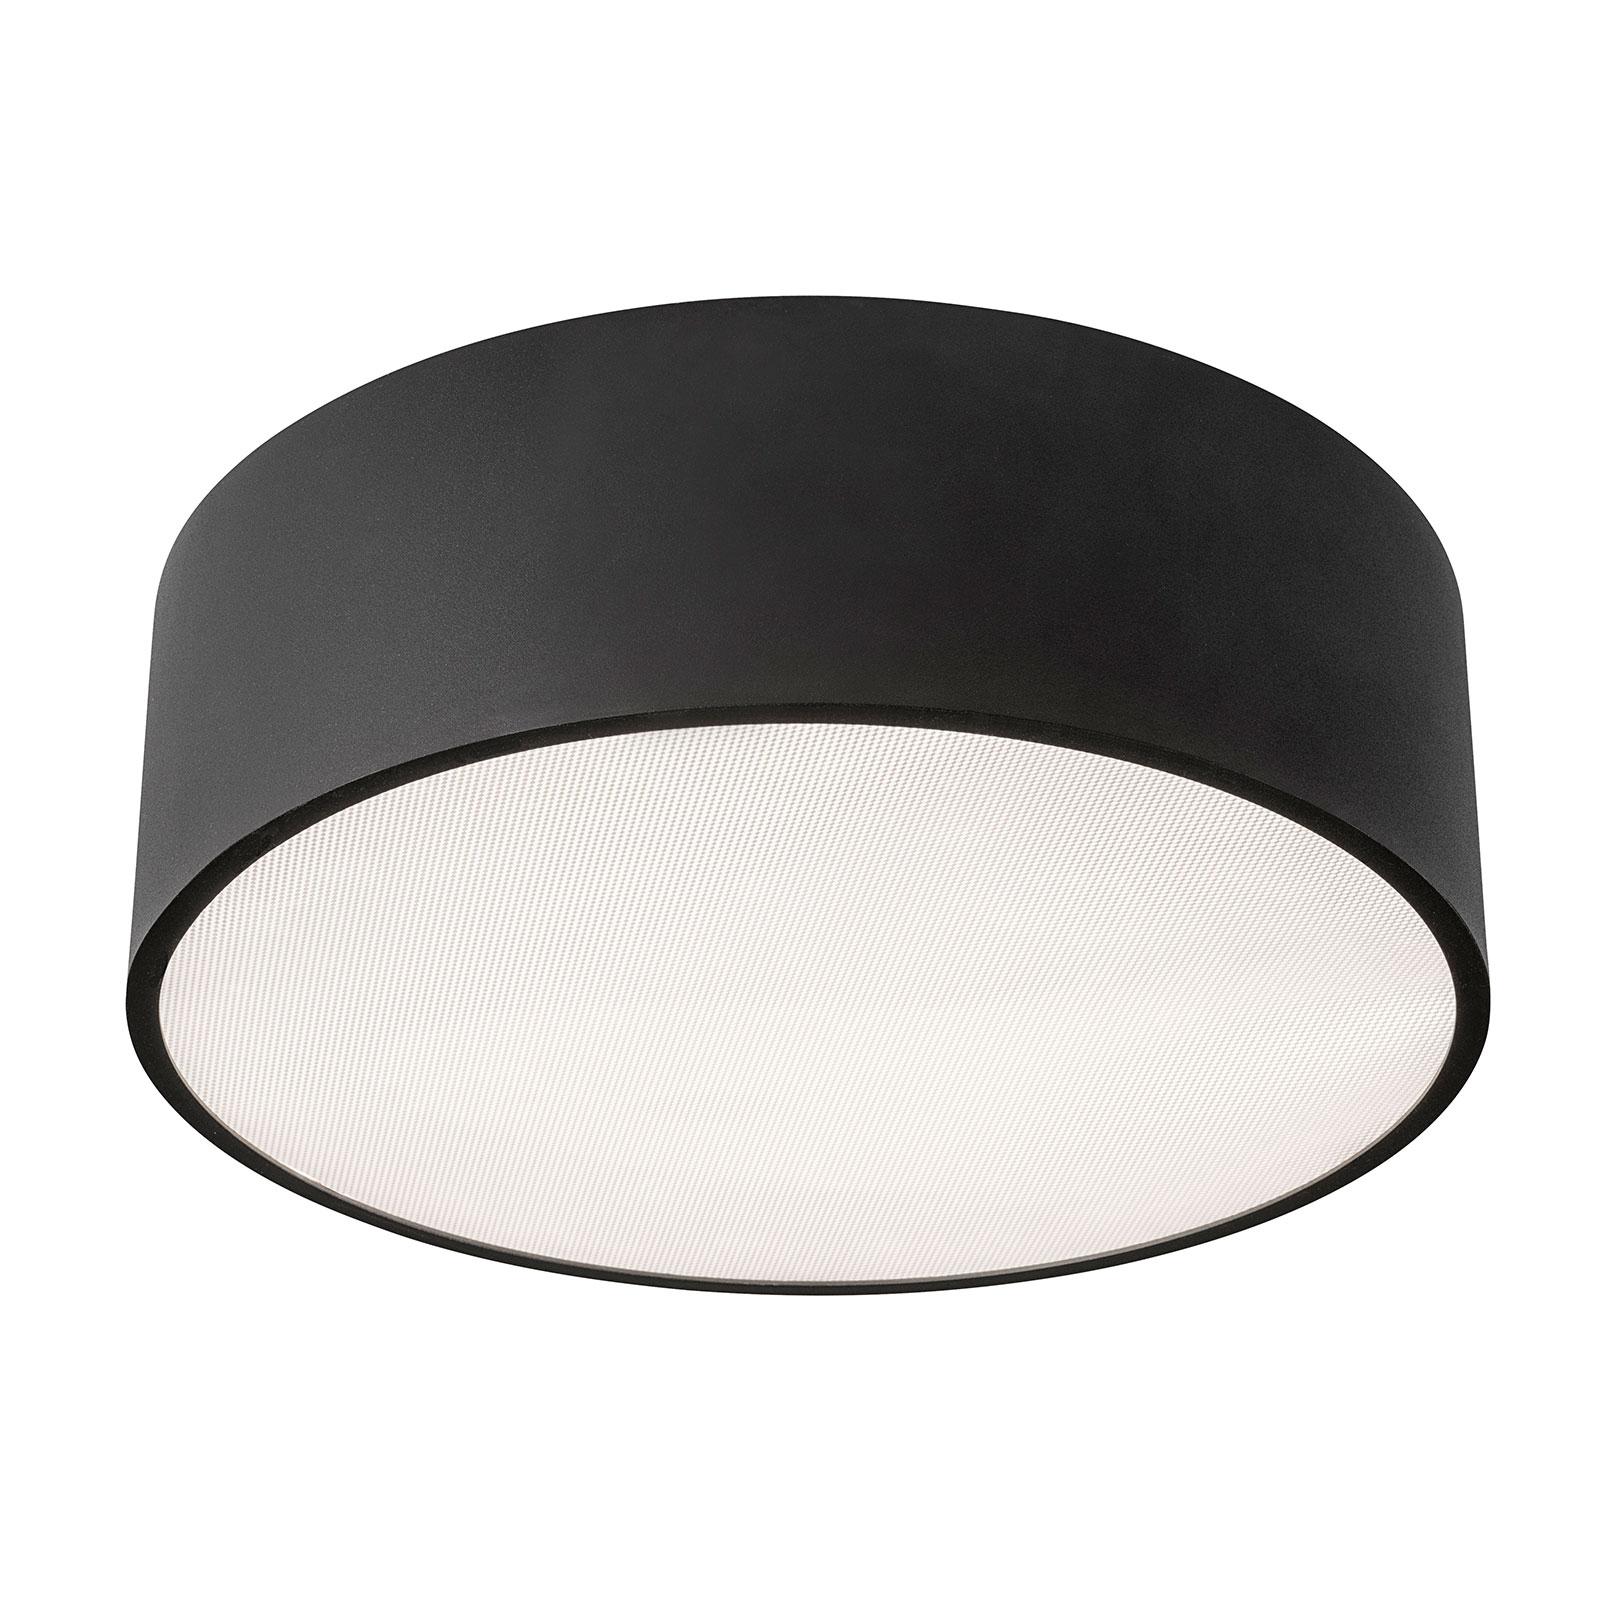 LEDS-C4 Luno lampa sufitowa LED